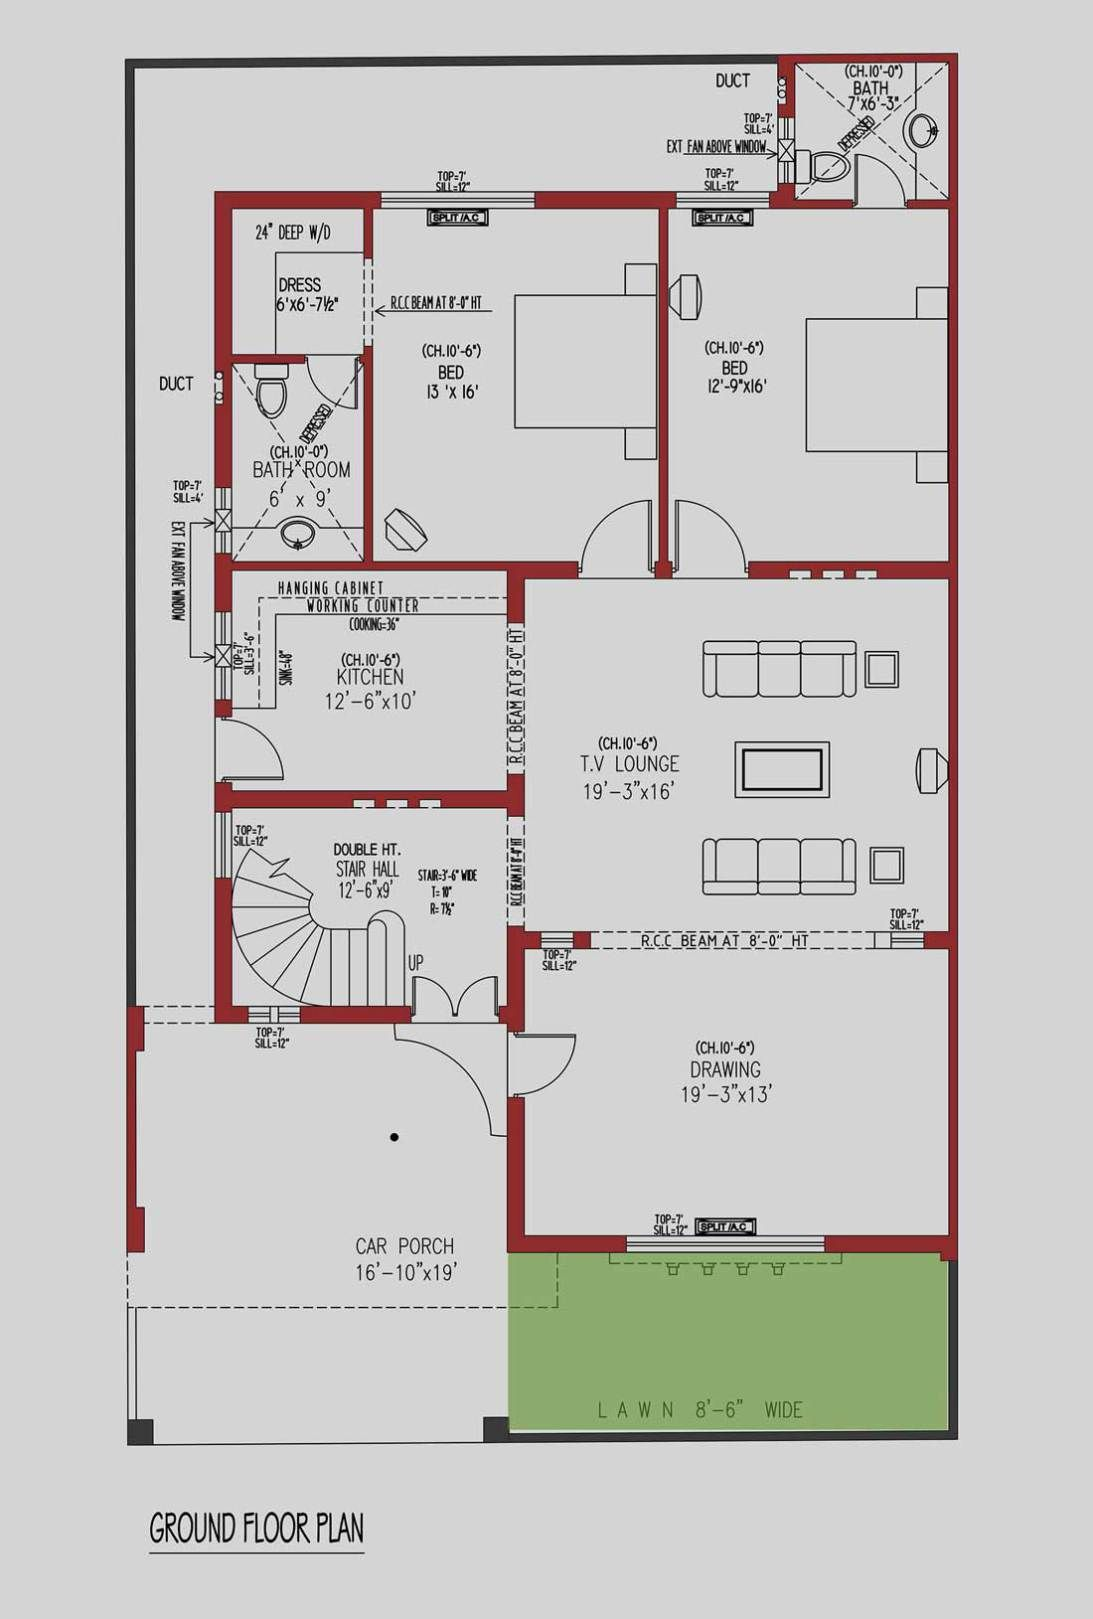 10 Marla House Plan 250 Sq Yds Architecture 360 Design Estate 2